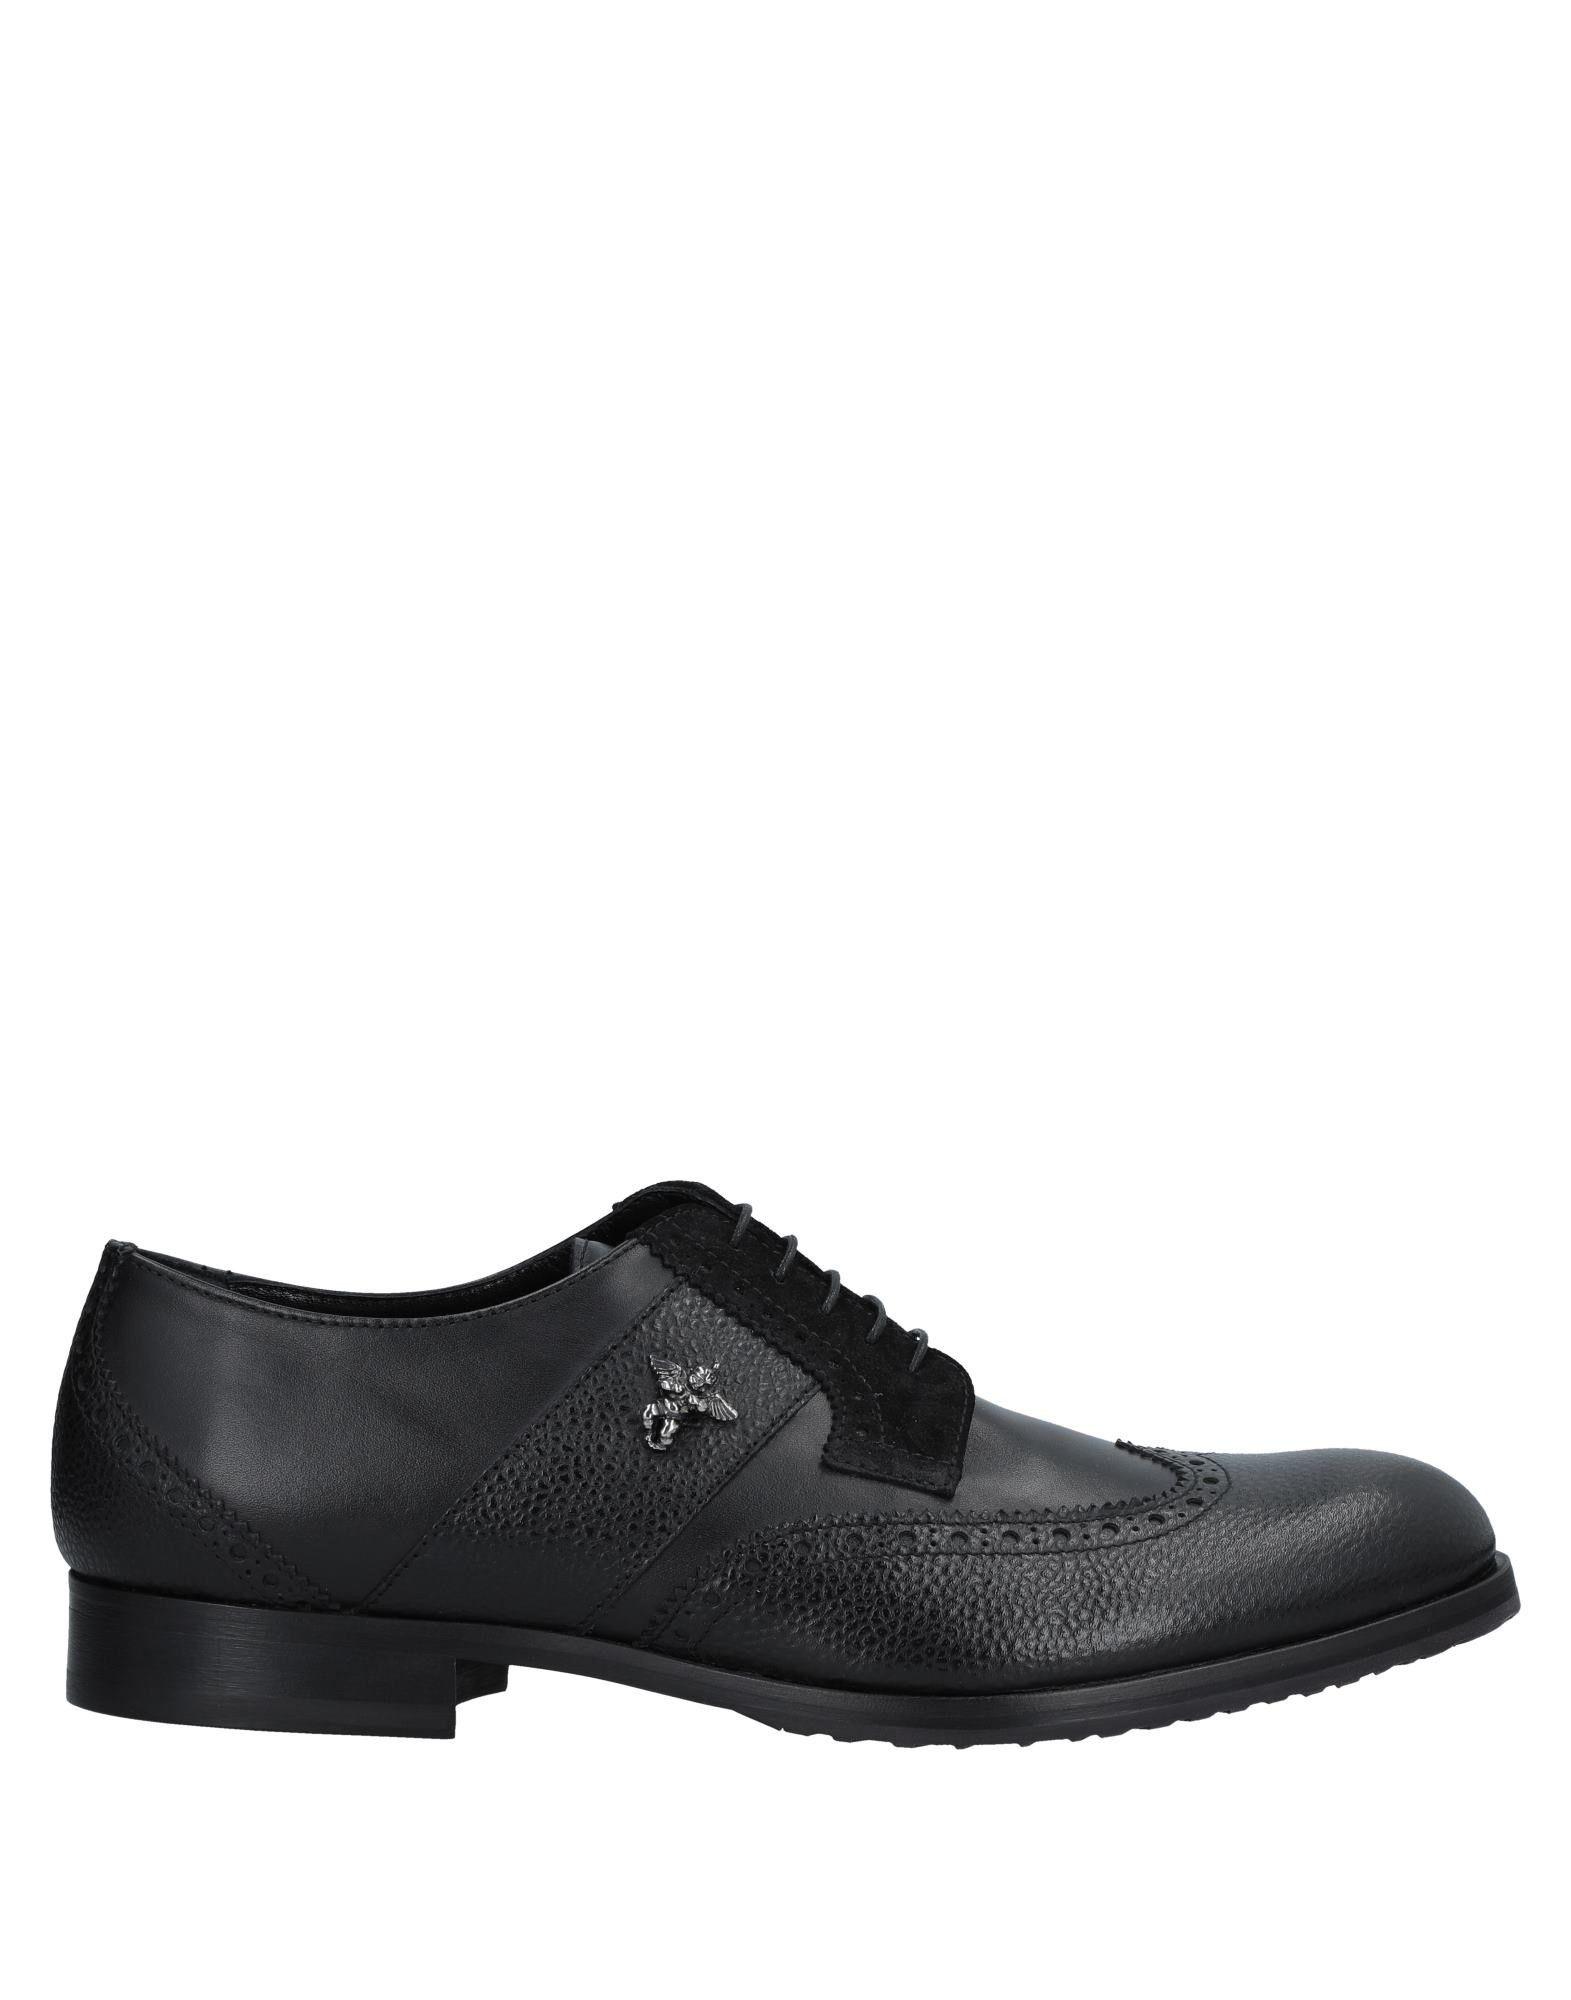 John Richmond Schnürschuhe Herren  11531174OQ Gute Qualität beliebte Schuhe